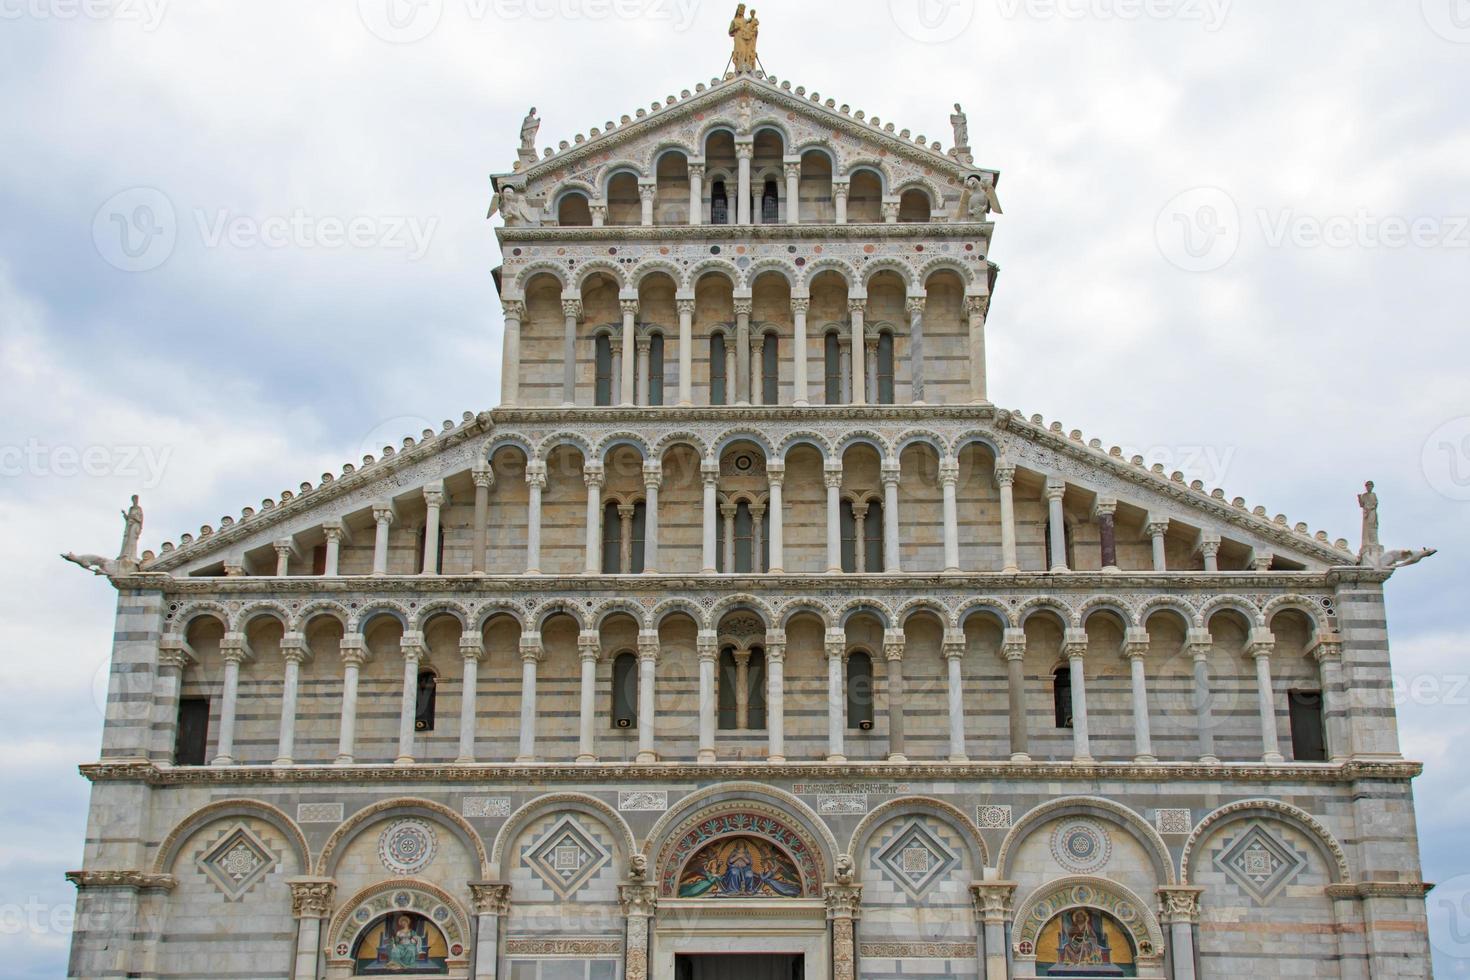 fachada de la catedral de pisa foto